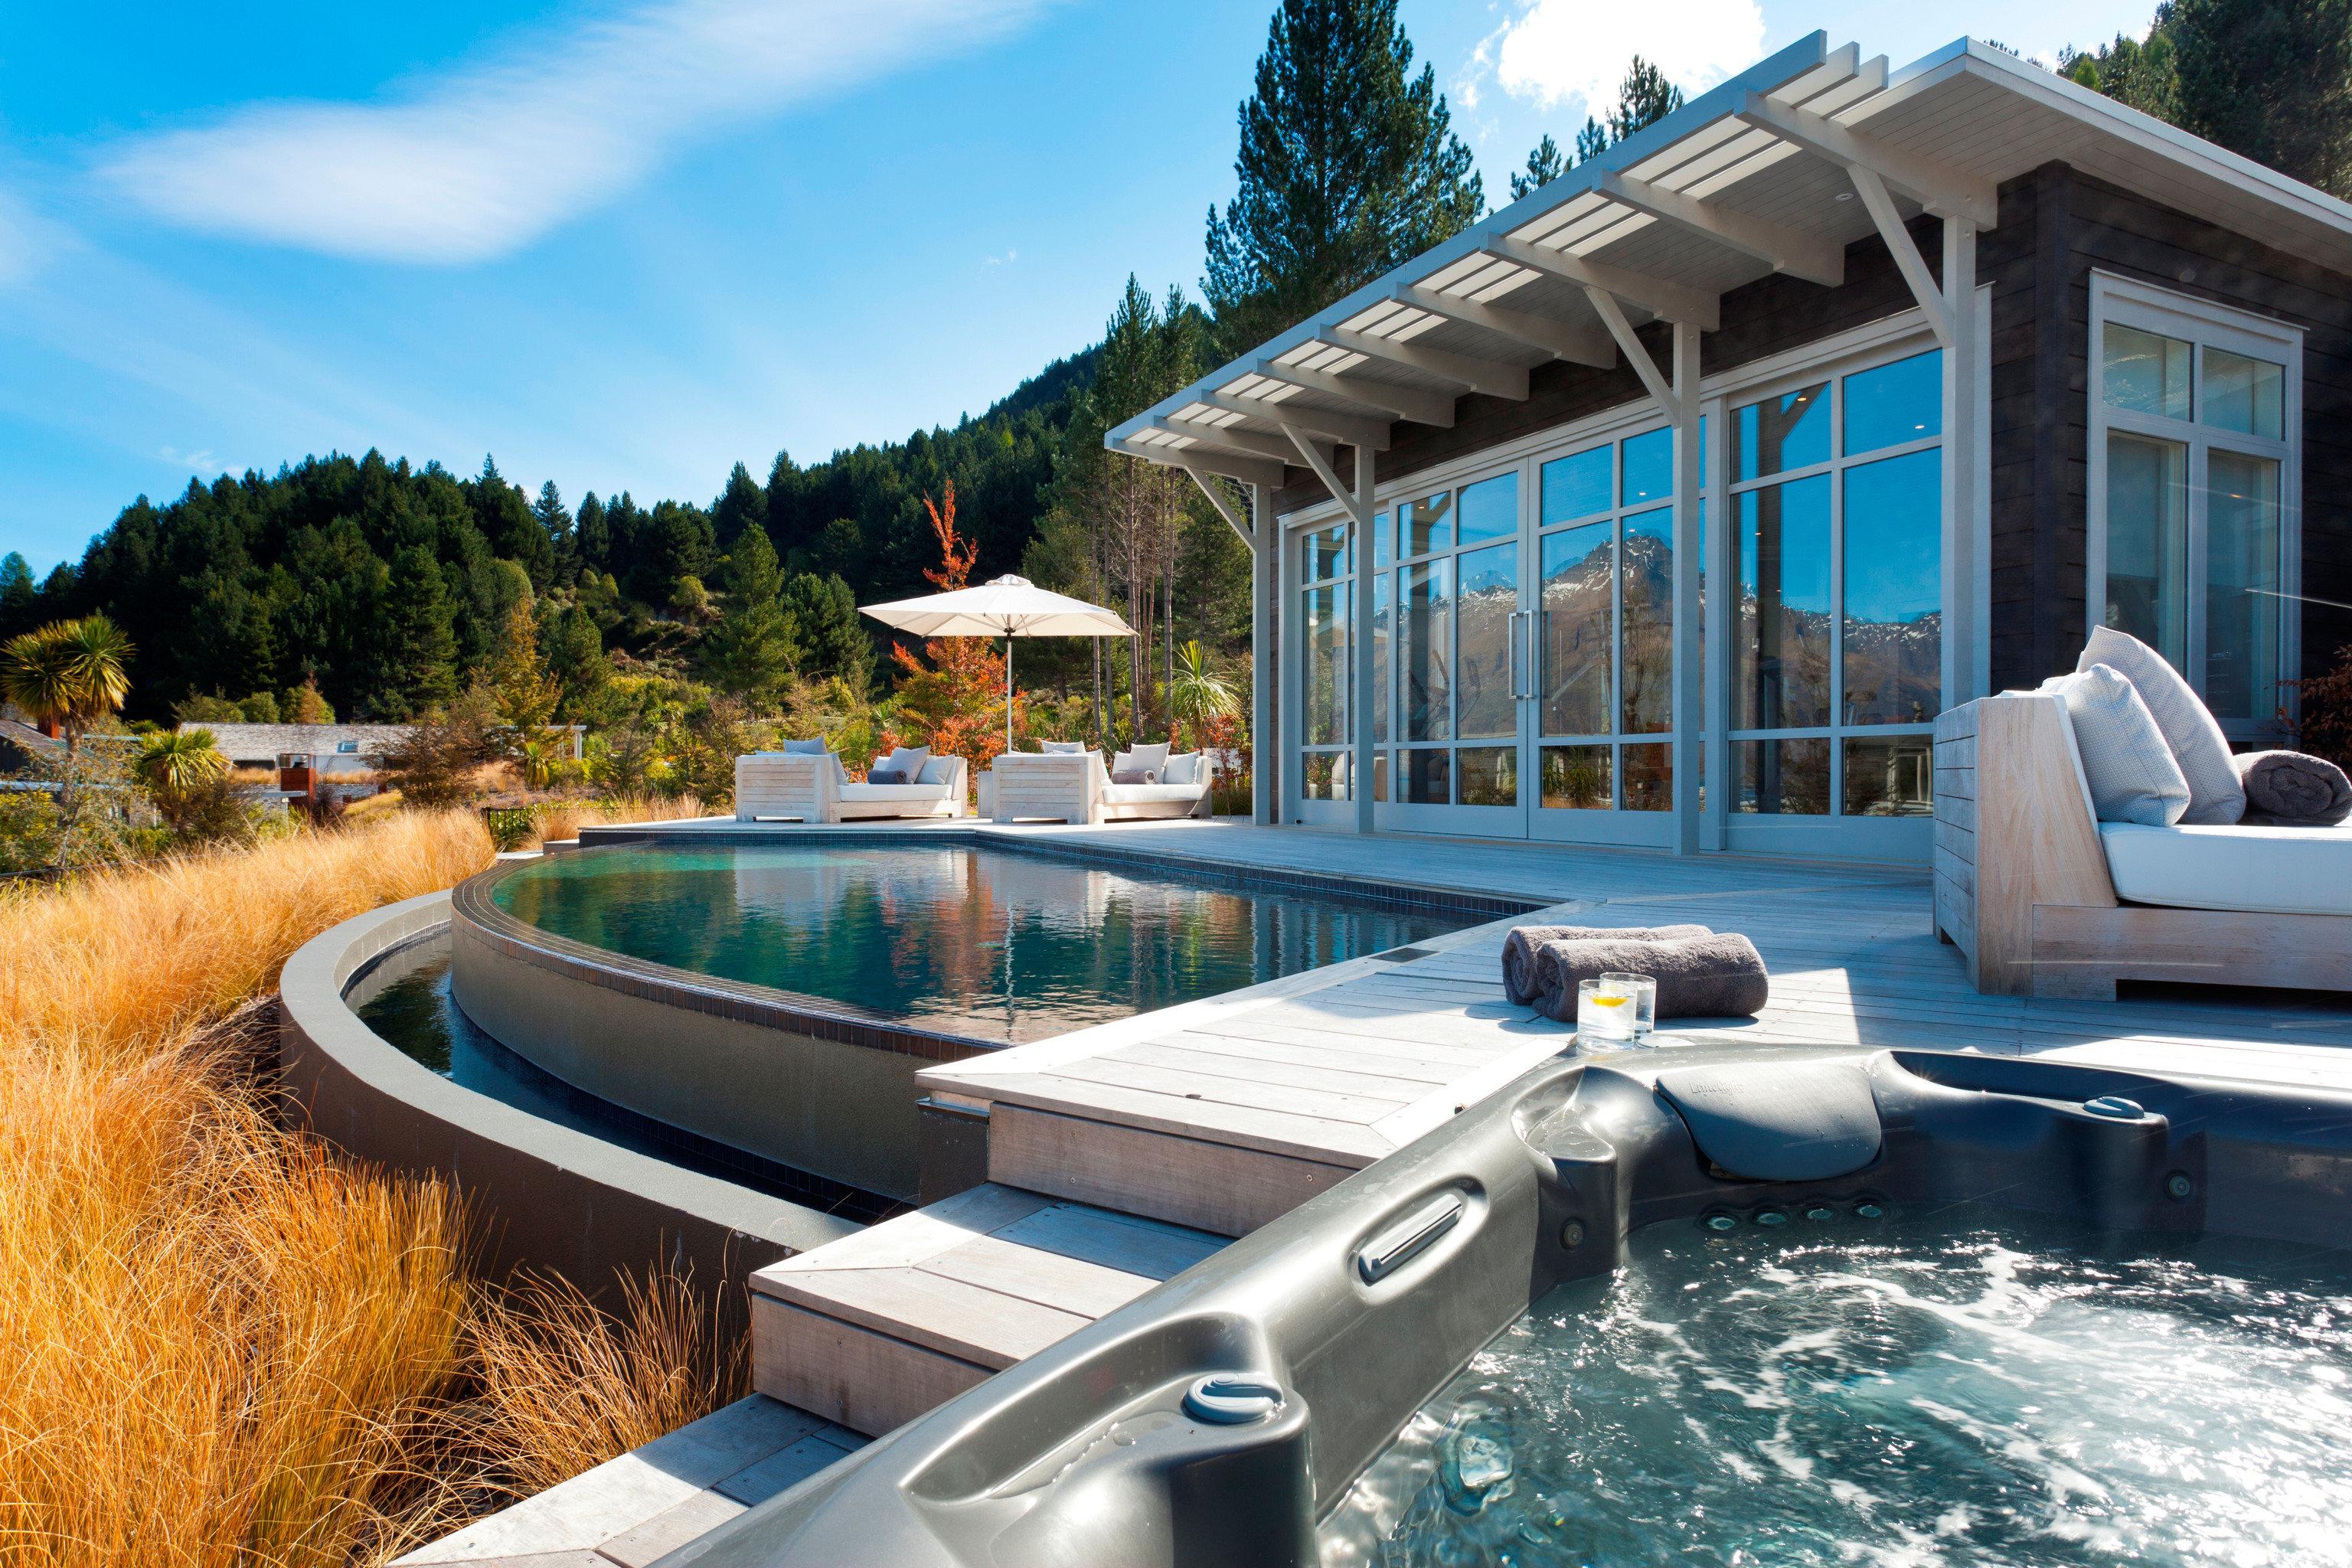 Trip Ideas sky swimming pool leisure property vehicle Resort home Villa backyard Deck